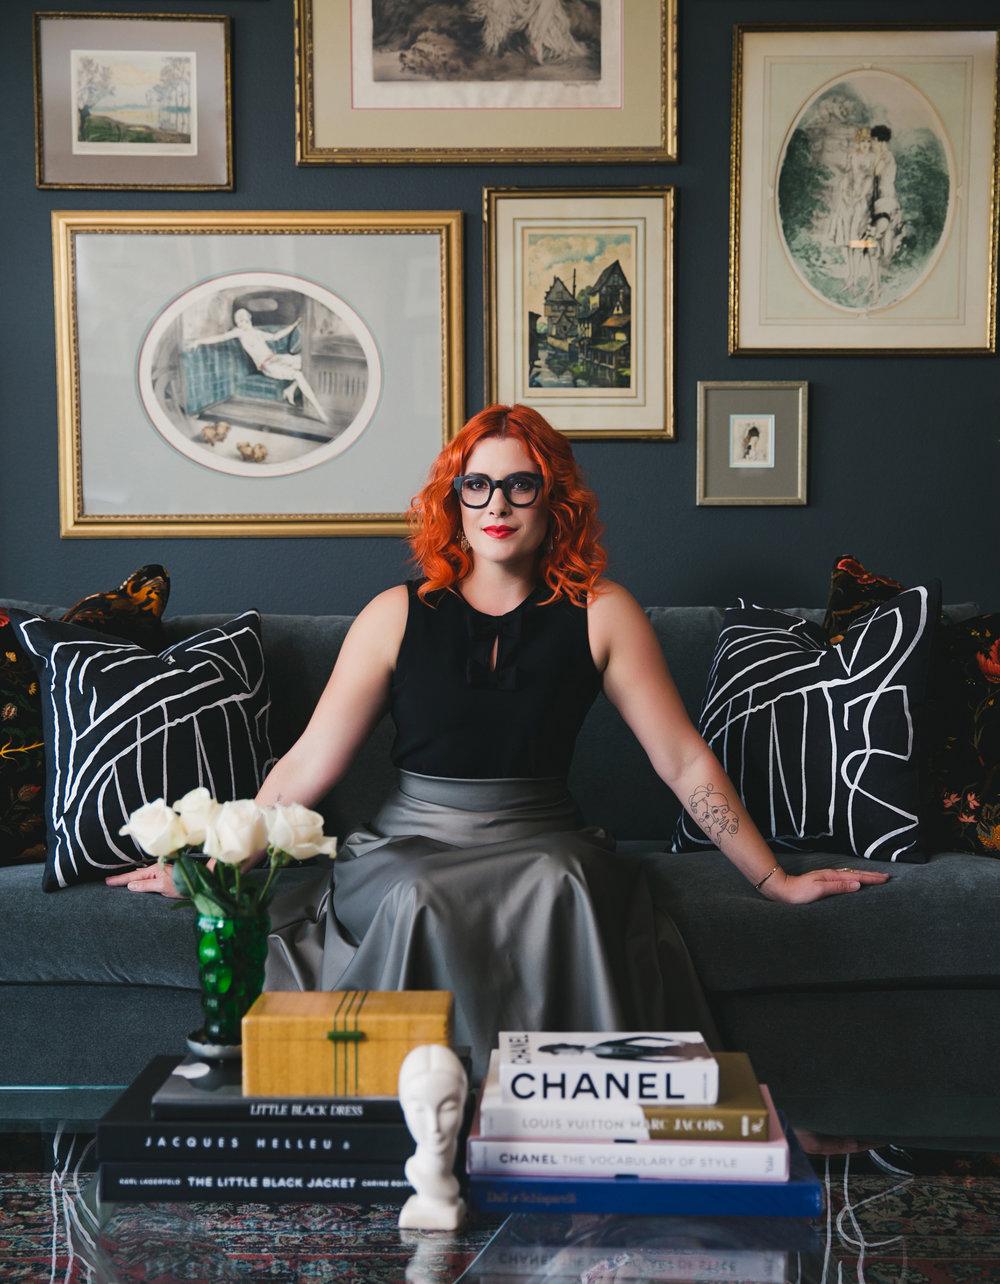 LISA GILMORE DESIGN - Interior DesignerAn elegant branding and minimal website showcasing multiple design projects for this fast growing luxury interior design business.